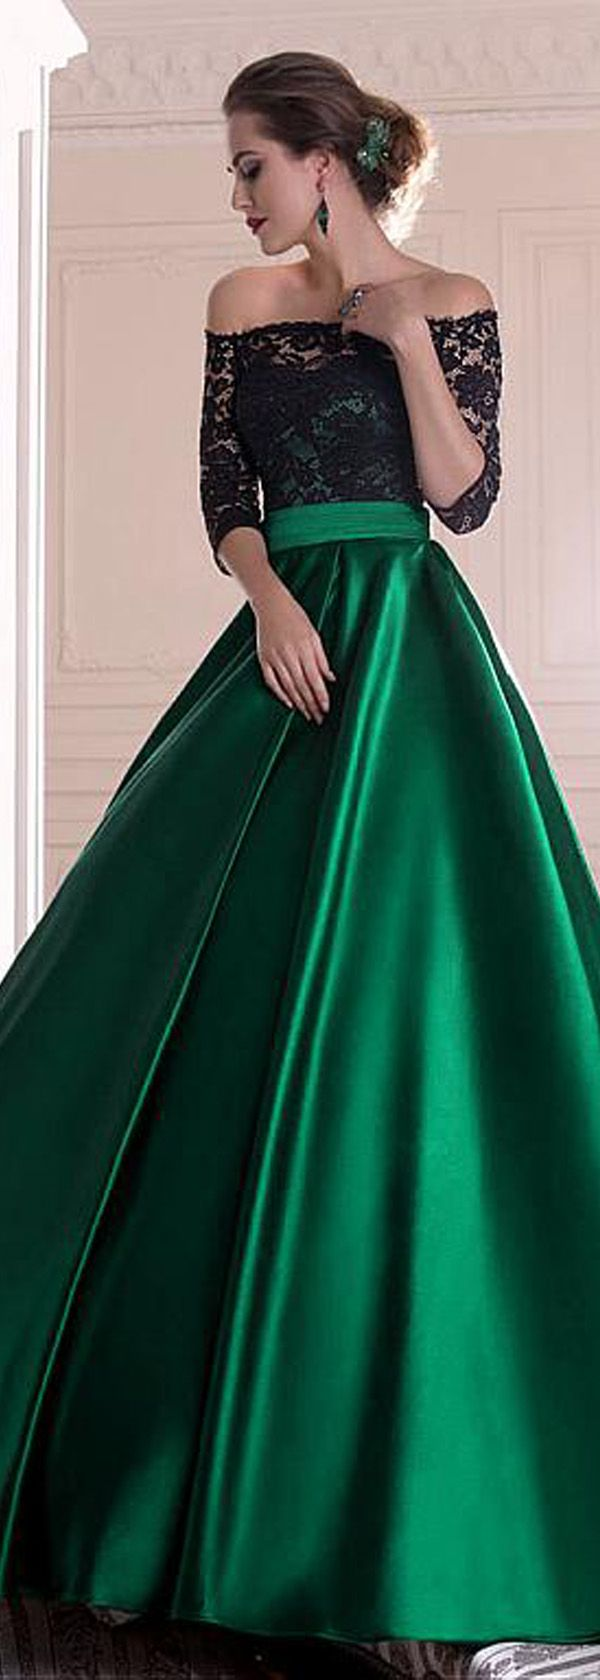 Graceful Lace & Satin Off-the-shoulder Neckline A-line Evening Dresses With Pleats